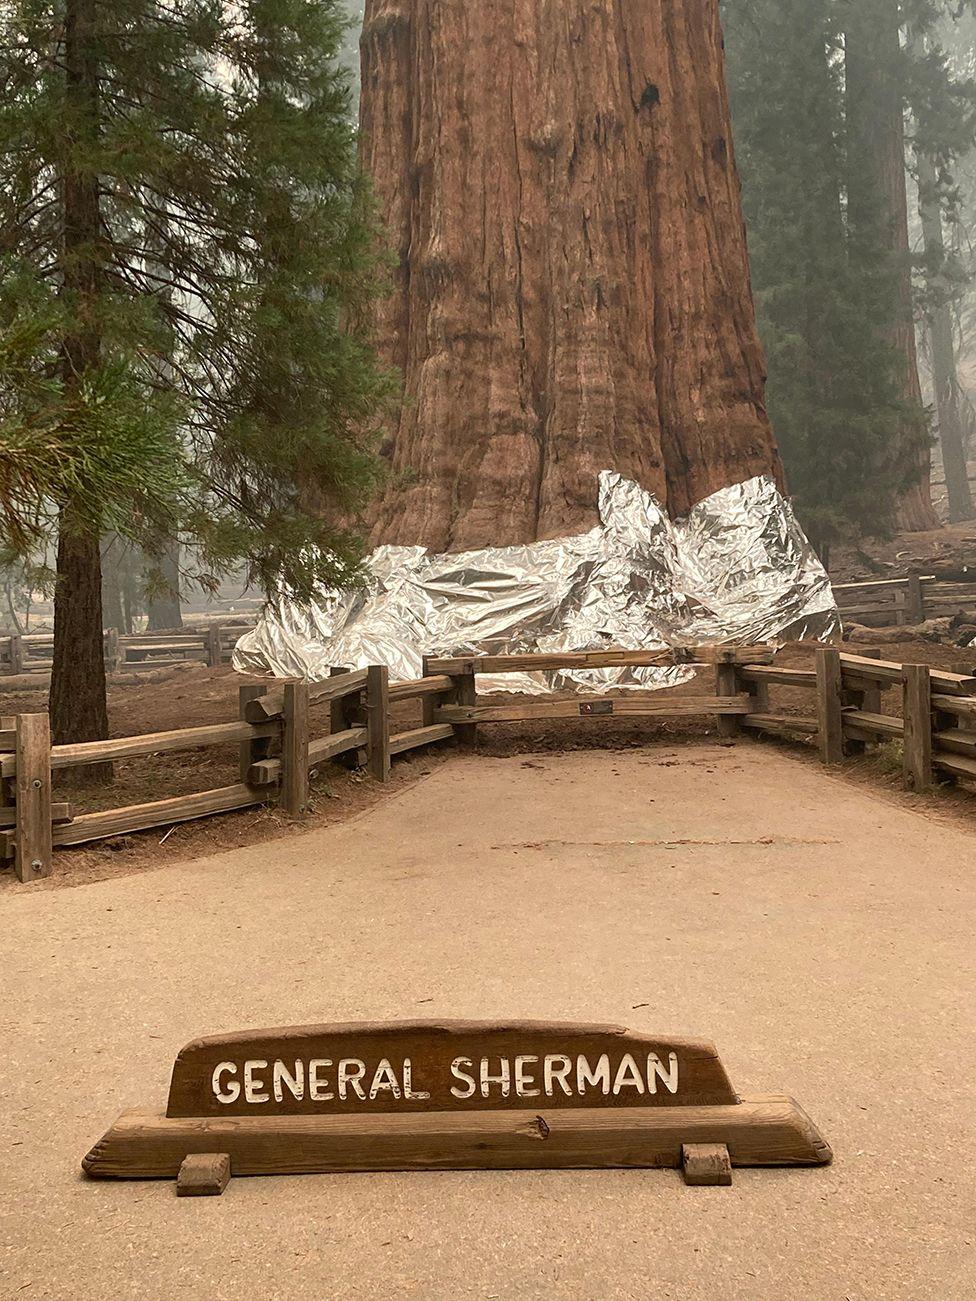 sequoia cel mai mare arbore din lume generalul sherman